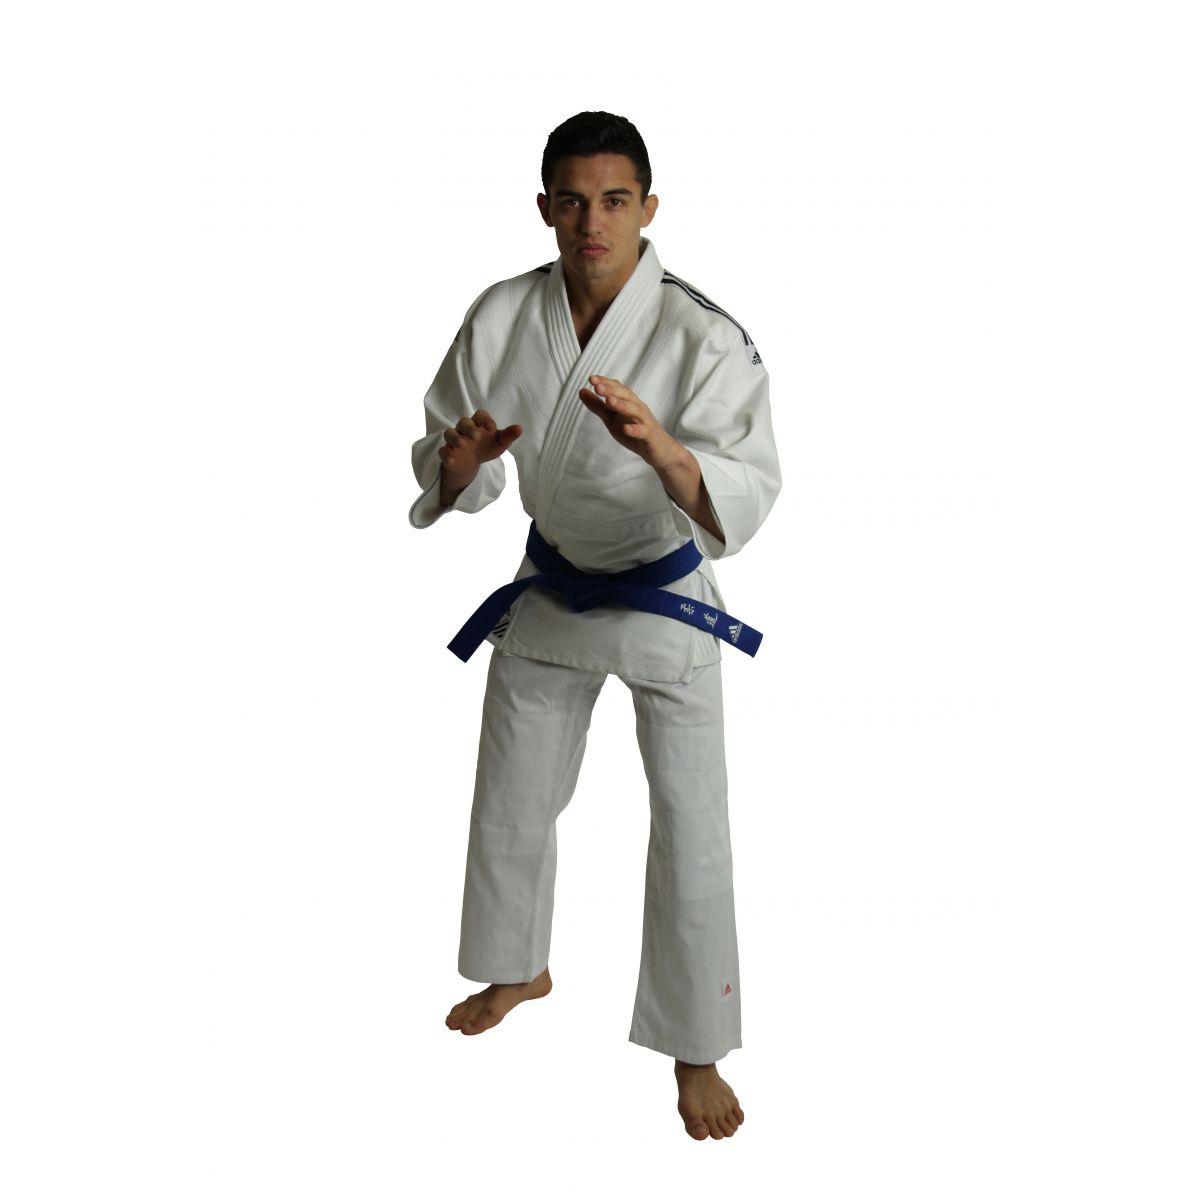 finest selection 63084 962ed adidas kimono de judo 500